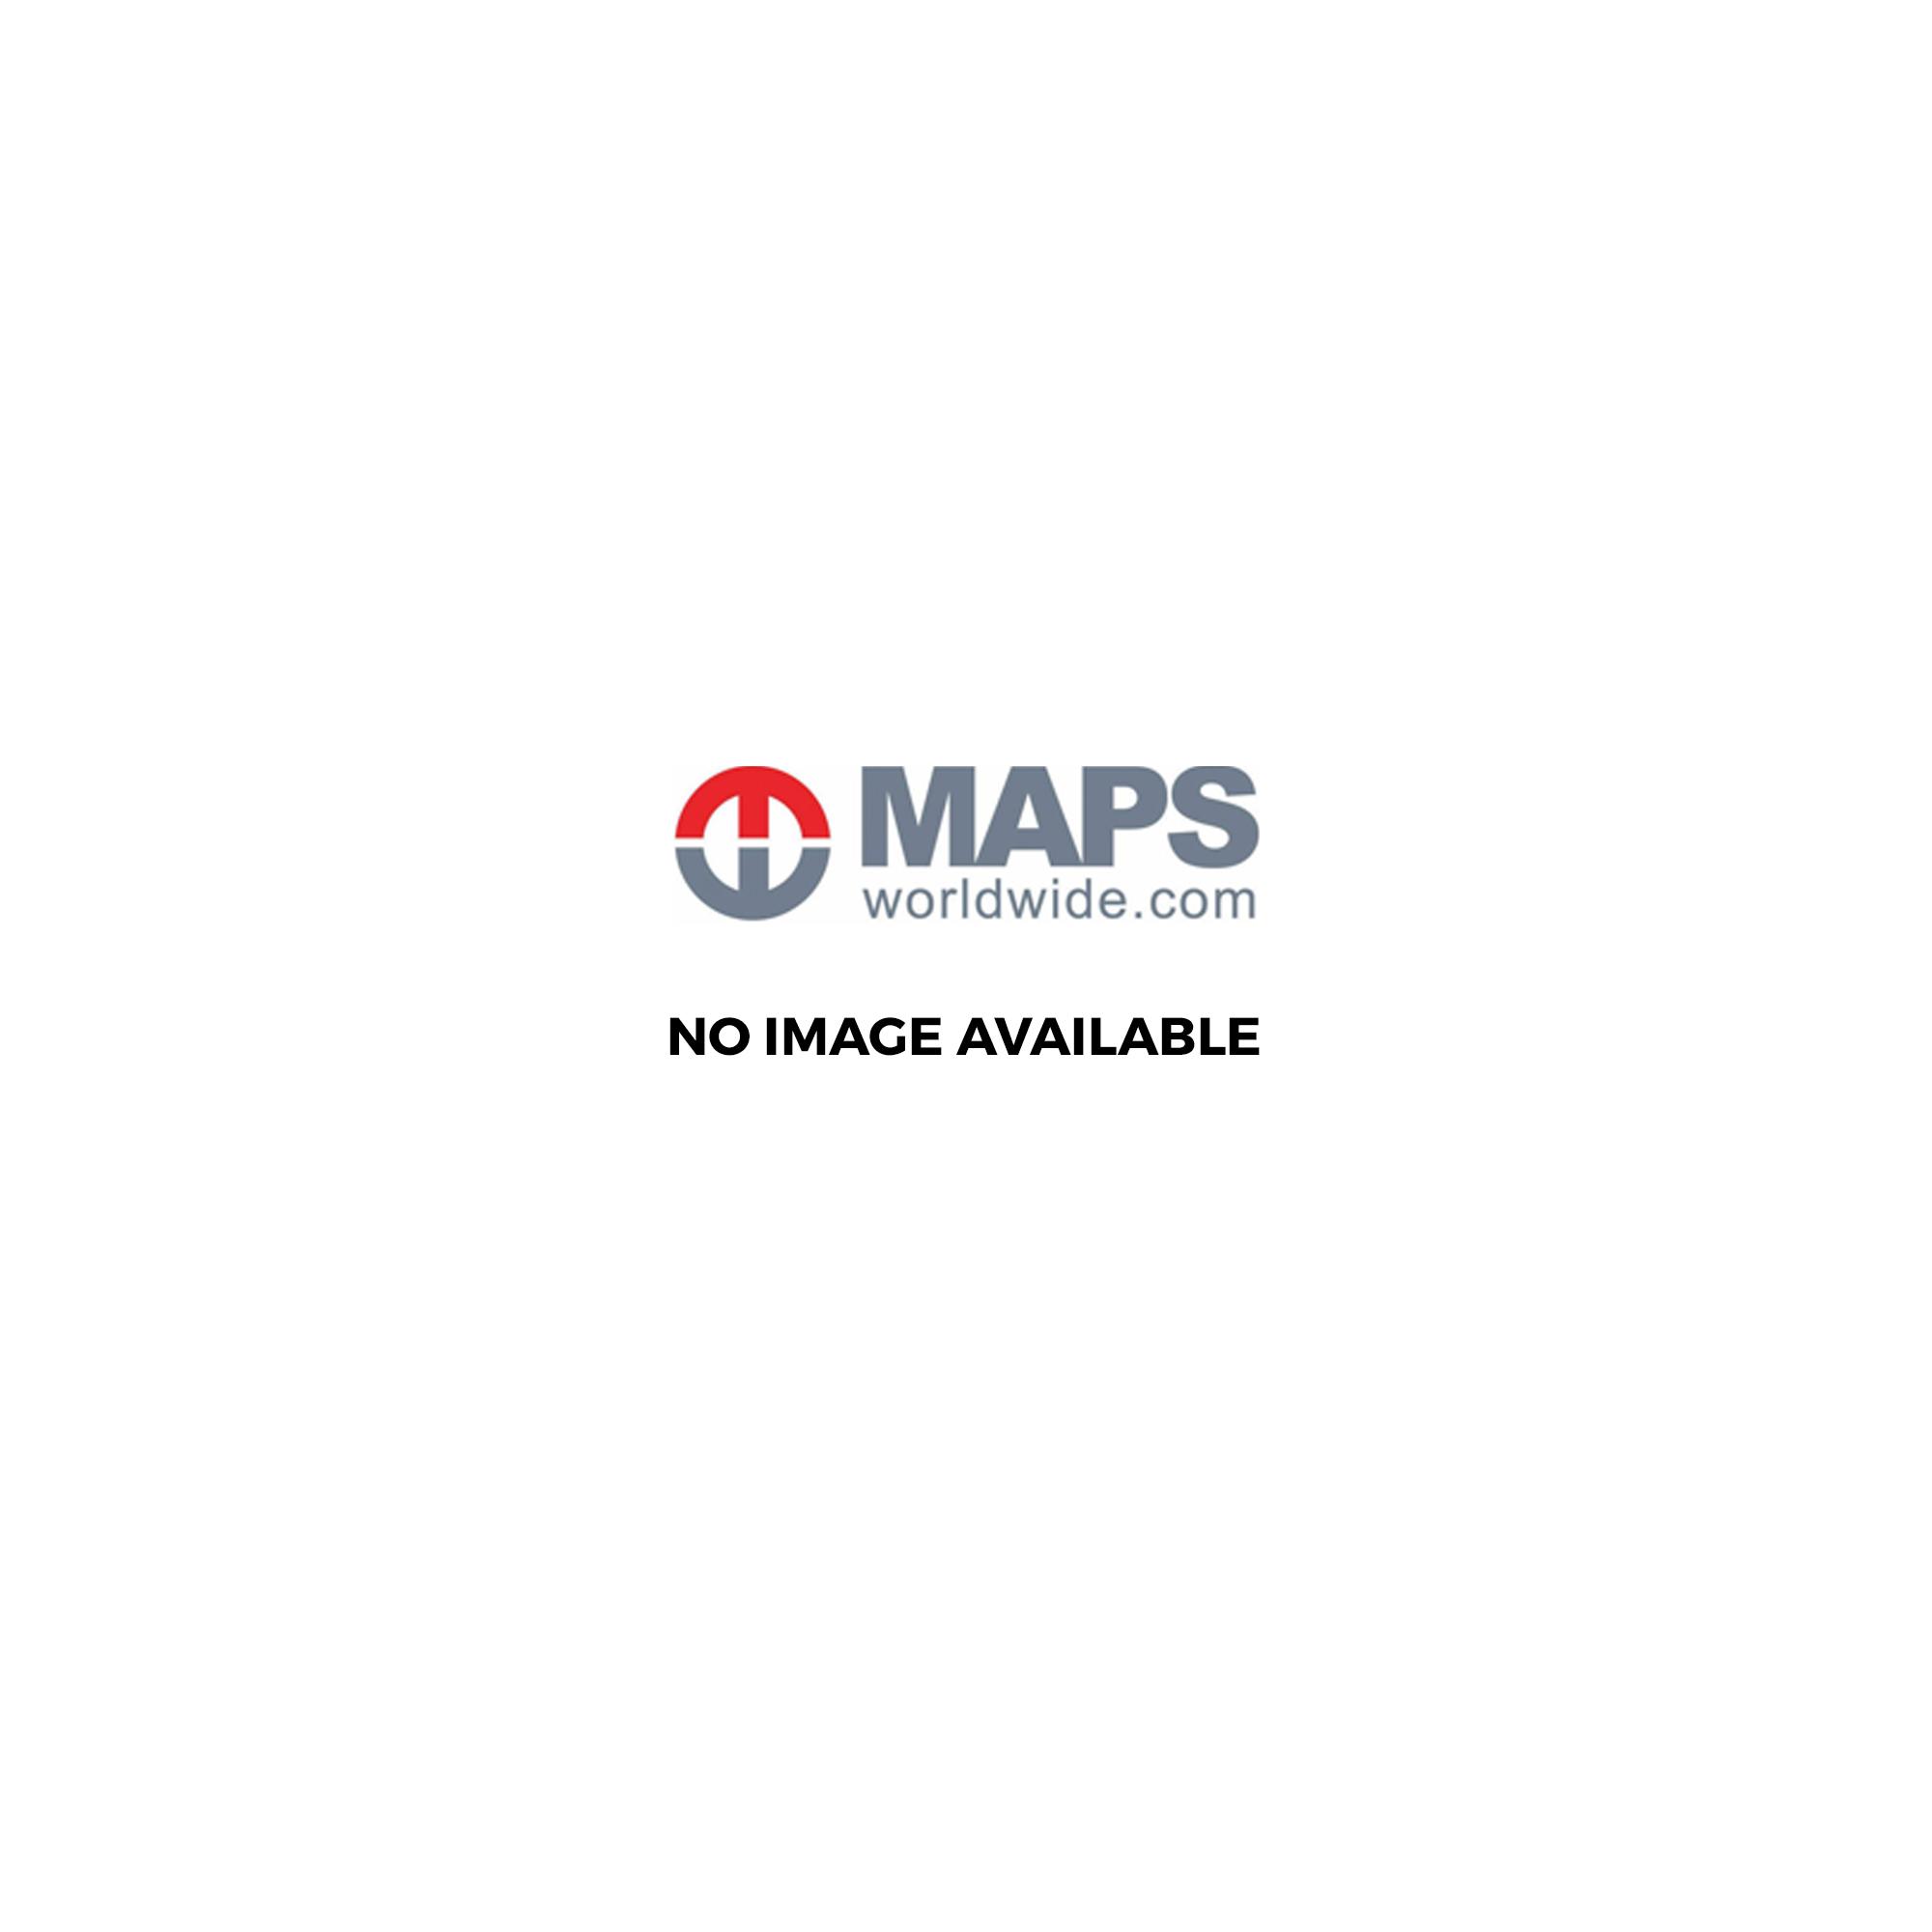 Leros Orama Map 327 Europe from Maps Worldwide UK